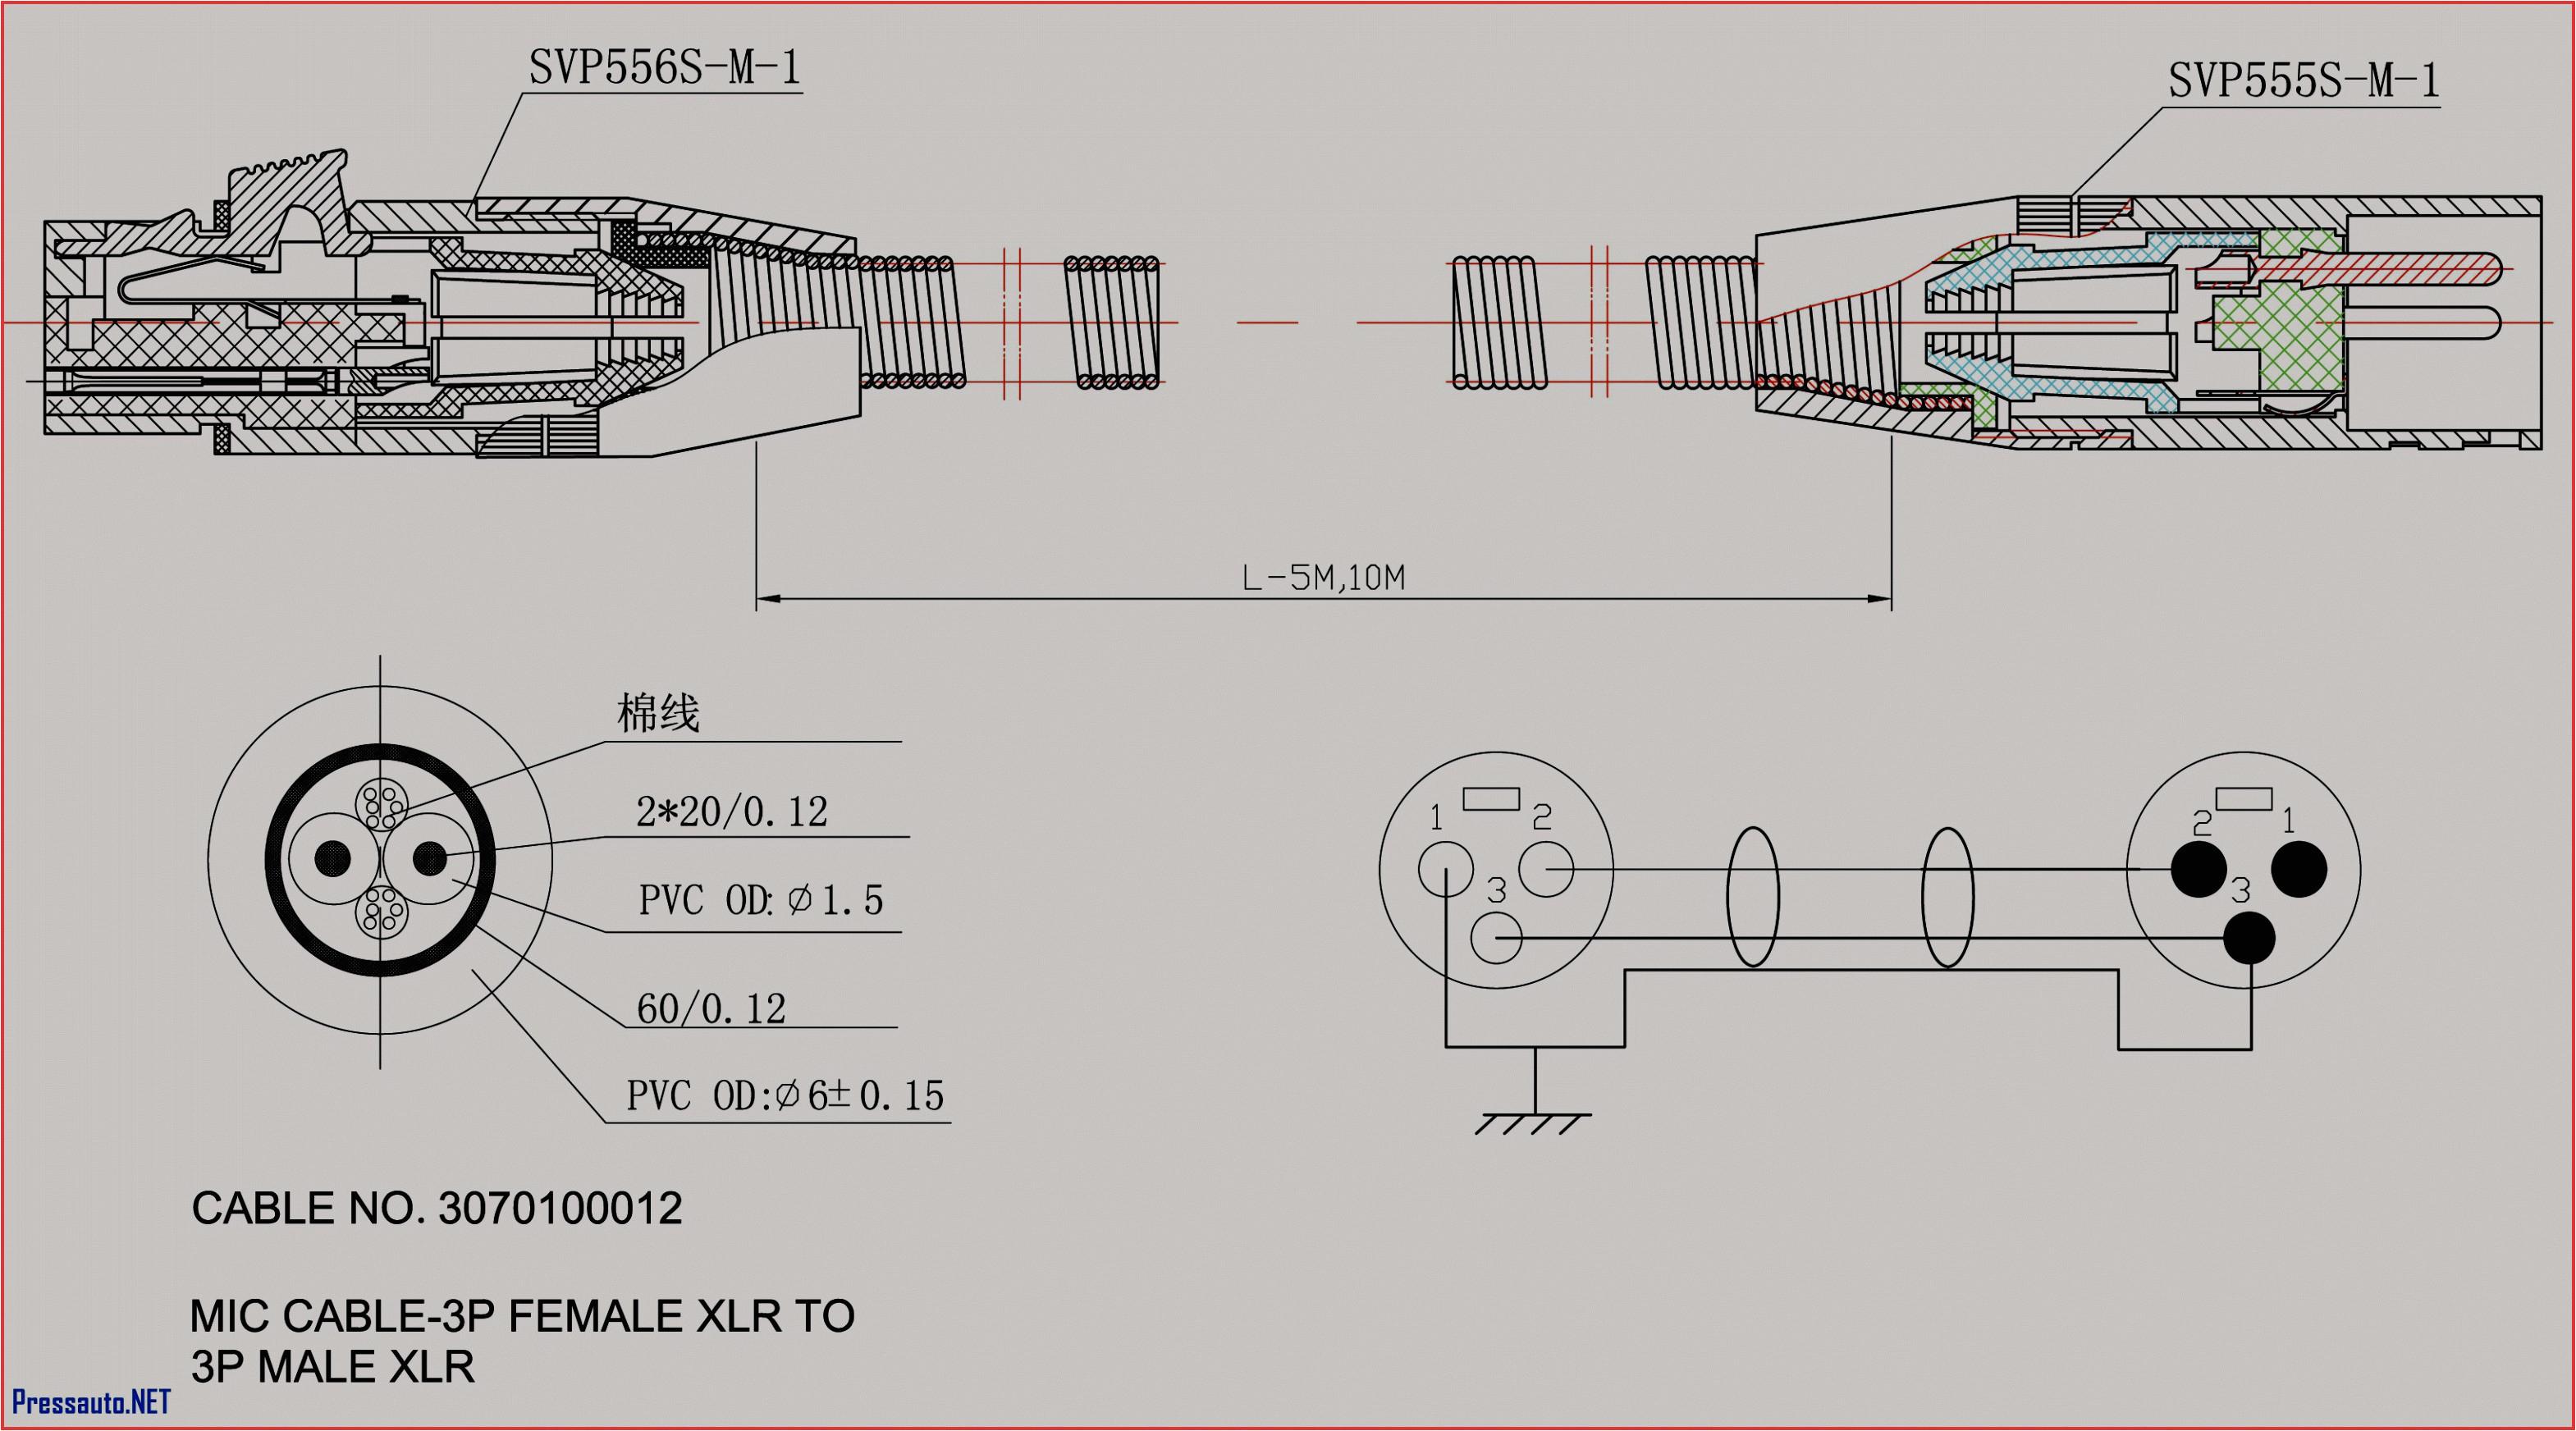 2012 F150 Trailer Wiring Diagram 202014 20ford F150 Trailer Wiring Harness Diagram Wiring Diagram Load